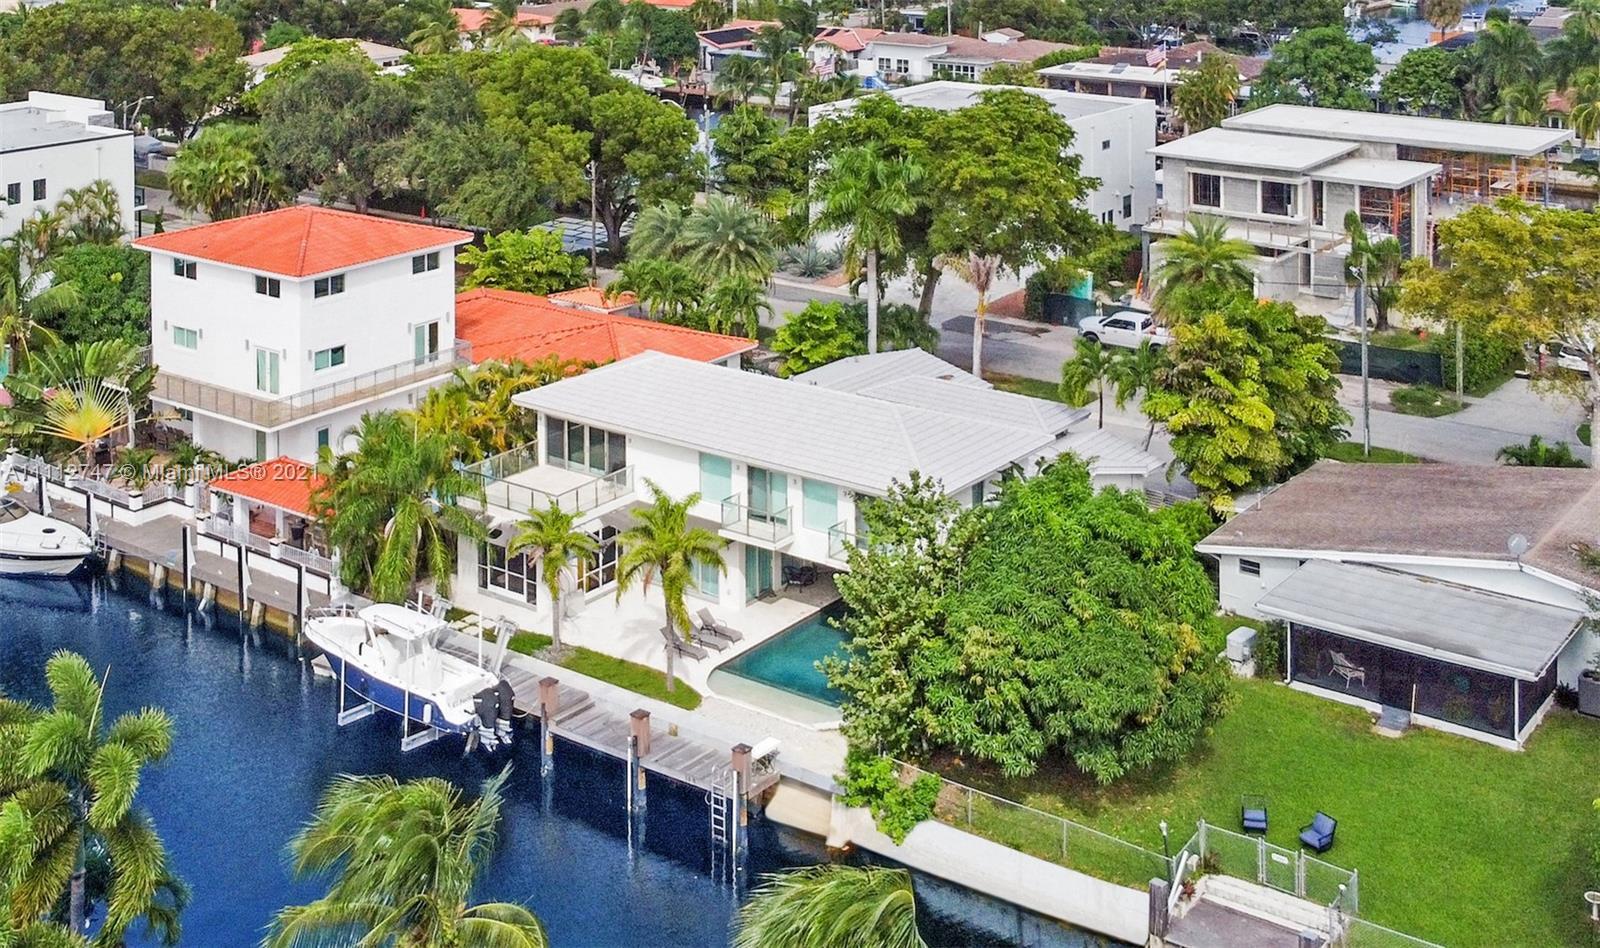 Single Family Home,For Sale,13100 Coronado Ln, North Miami, Florida 33181,Brickell,realty,broker,condos near me